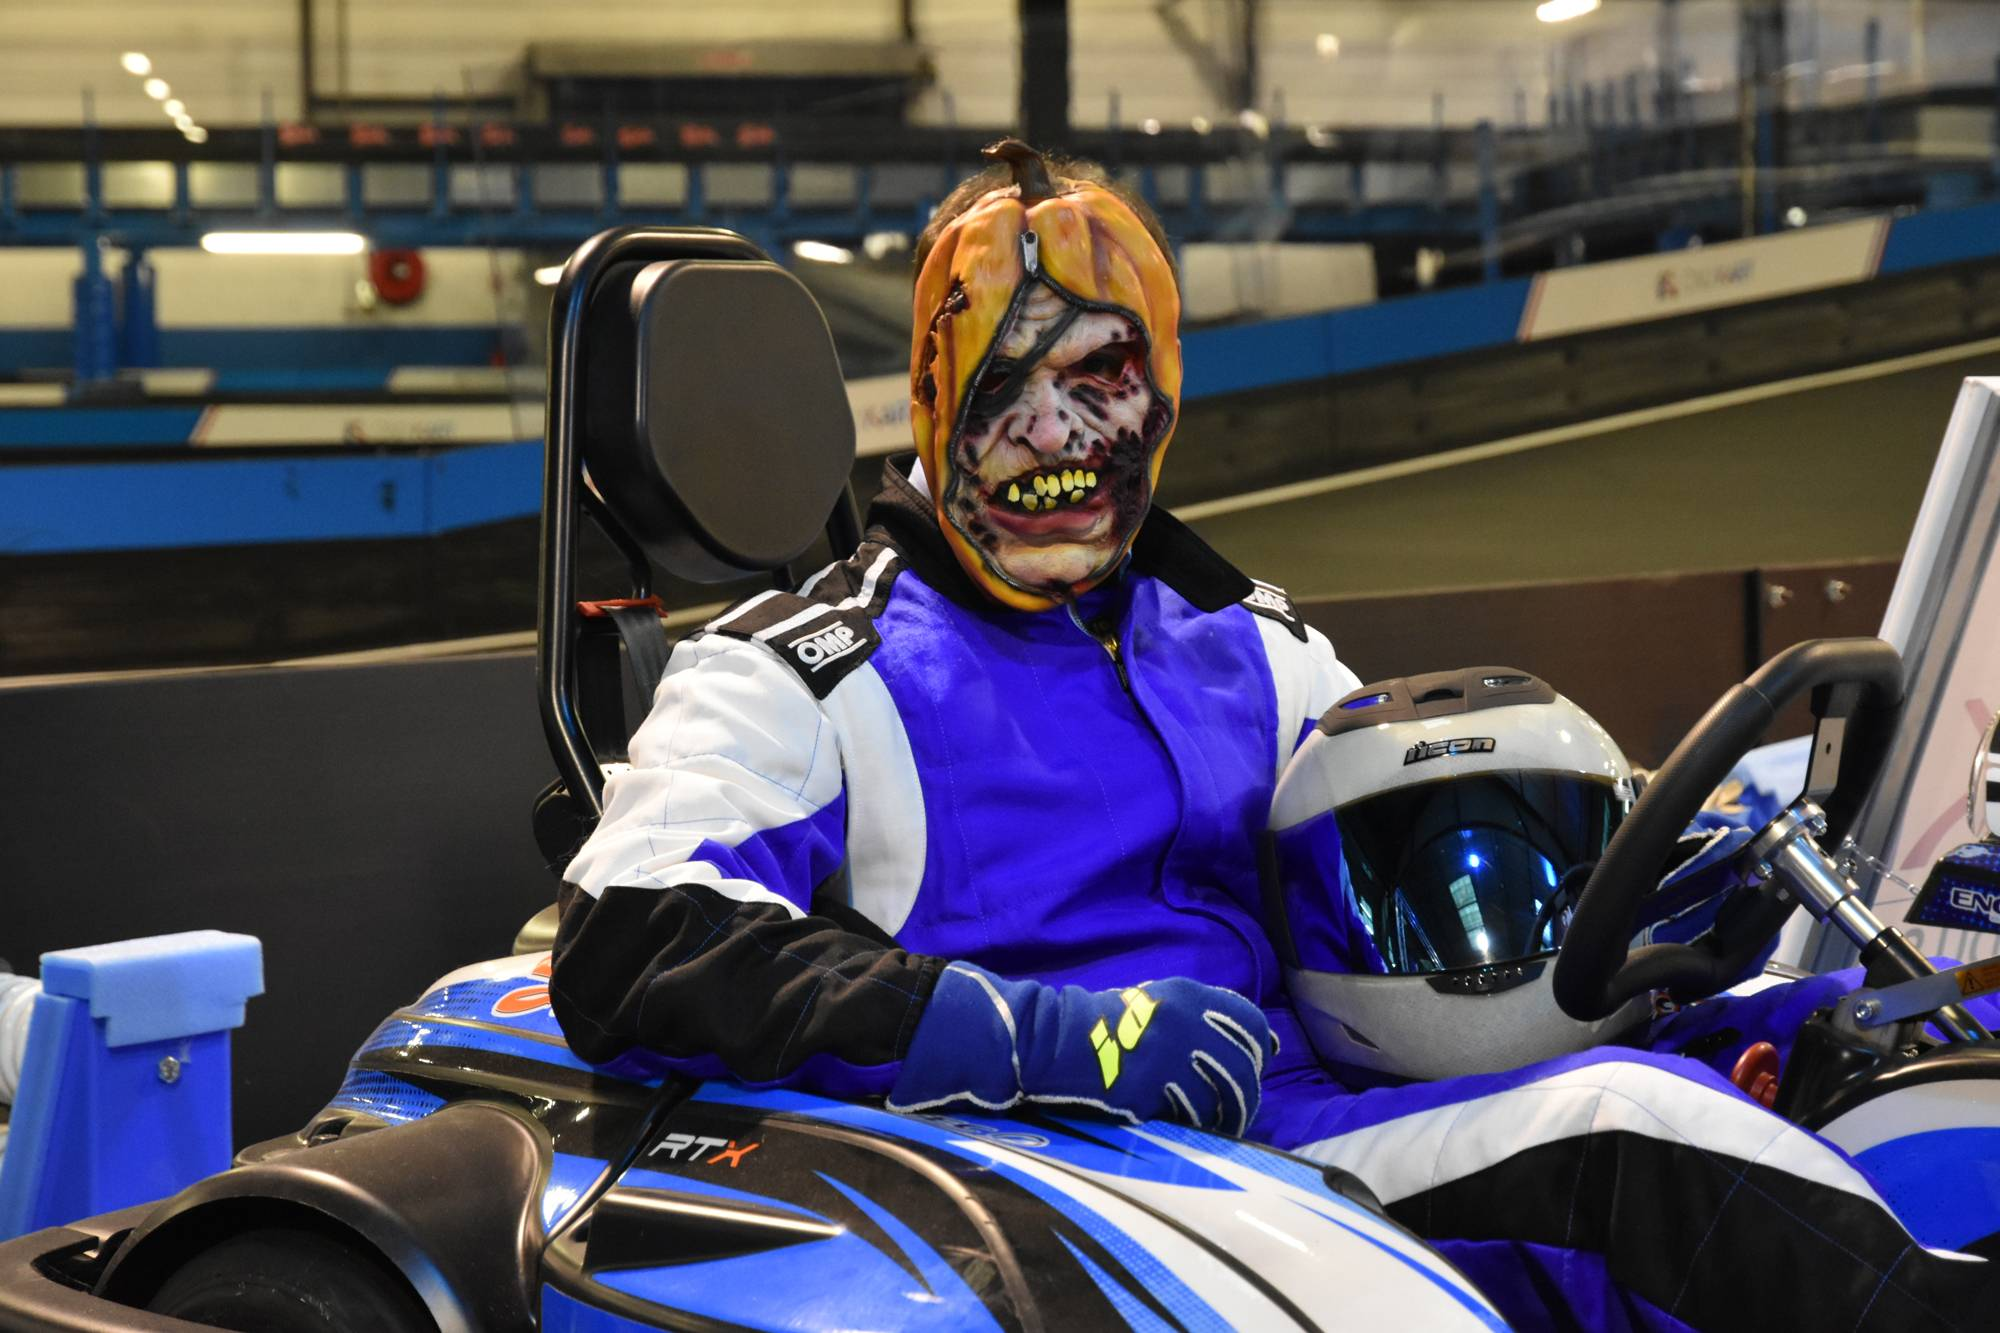 promotion karting lyon pour halloween